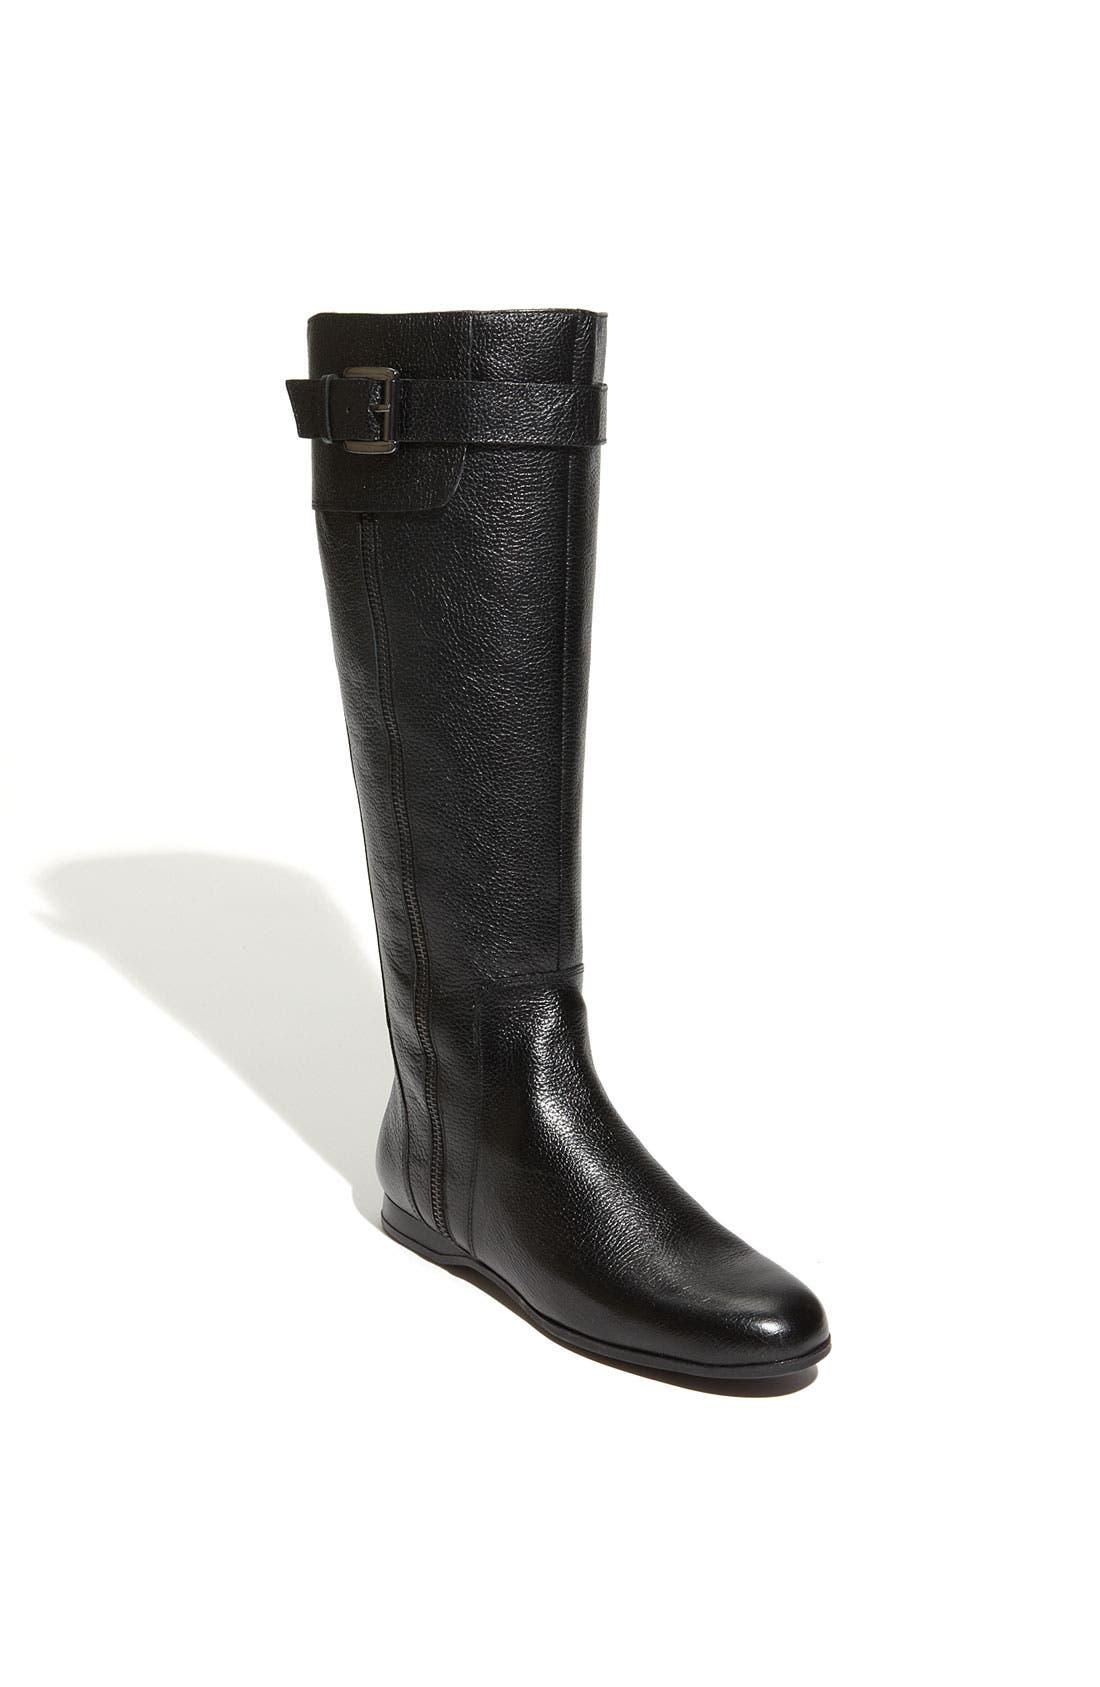 Main Image - Enzo Angiolini 'Zayra' Boot